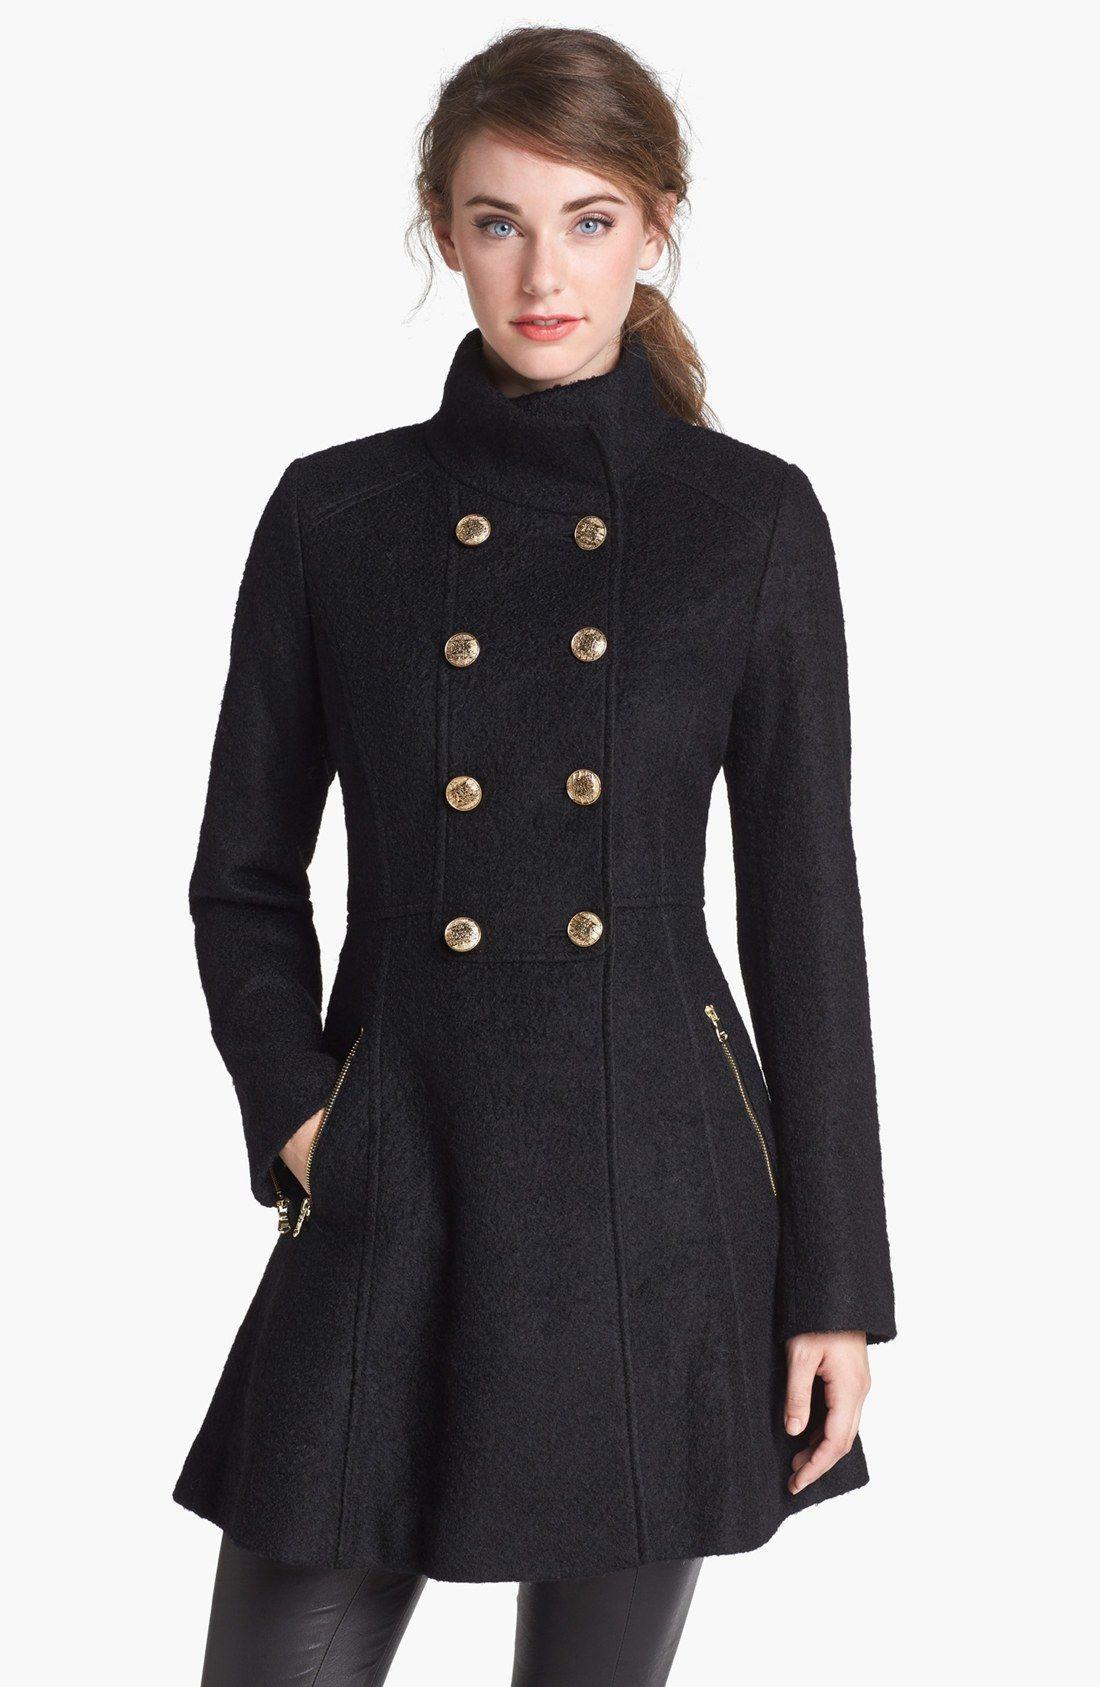 Black Fit Flare Bouclé Military Coat - GUESS | Coats/Jackets ...